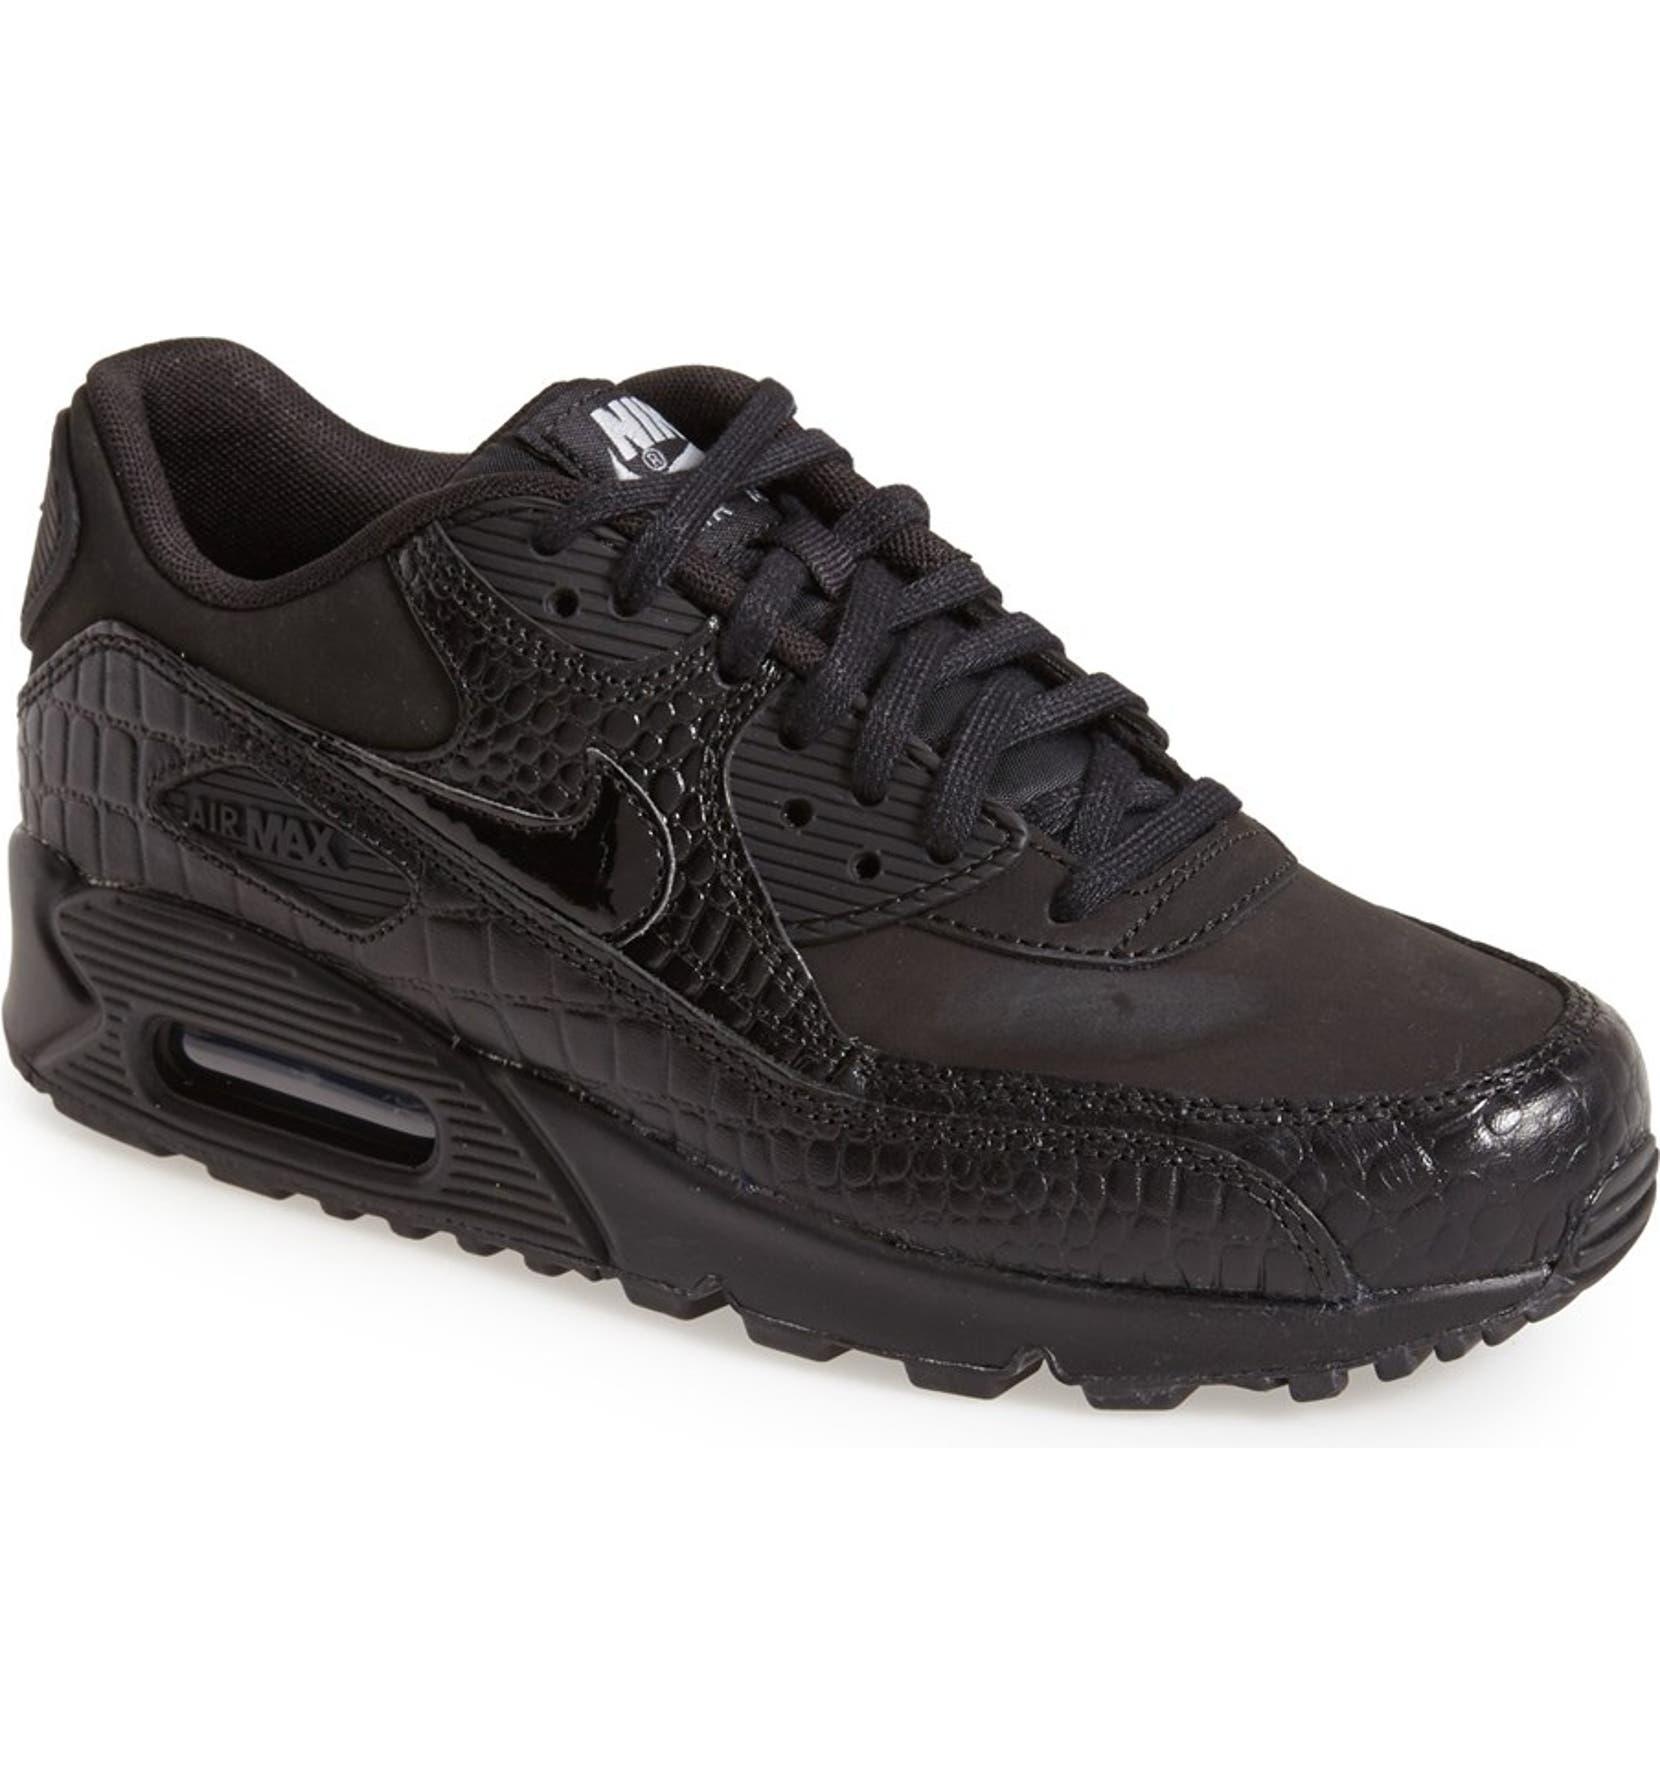 wholesale dealer cff76 ebe81 Nike Air Max 90 - Premium Sneaker (Women)  Nordstrom